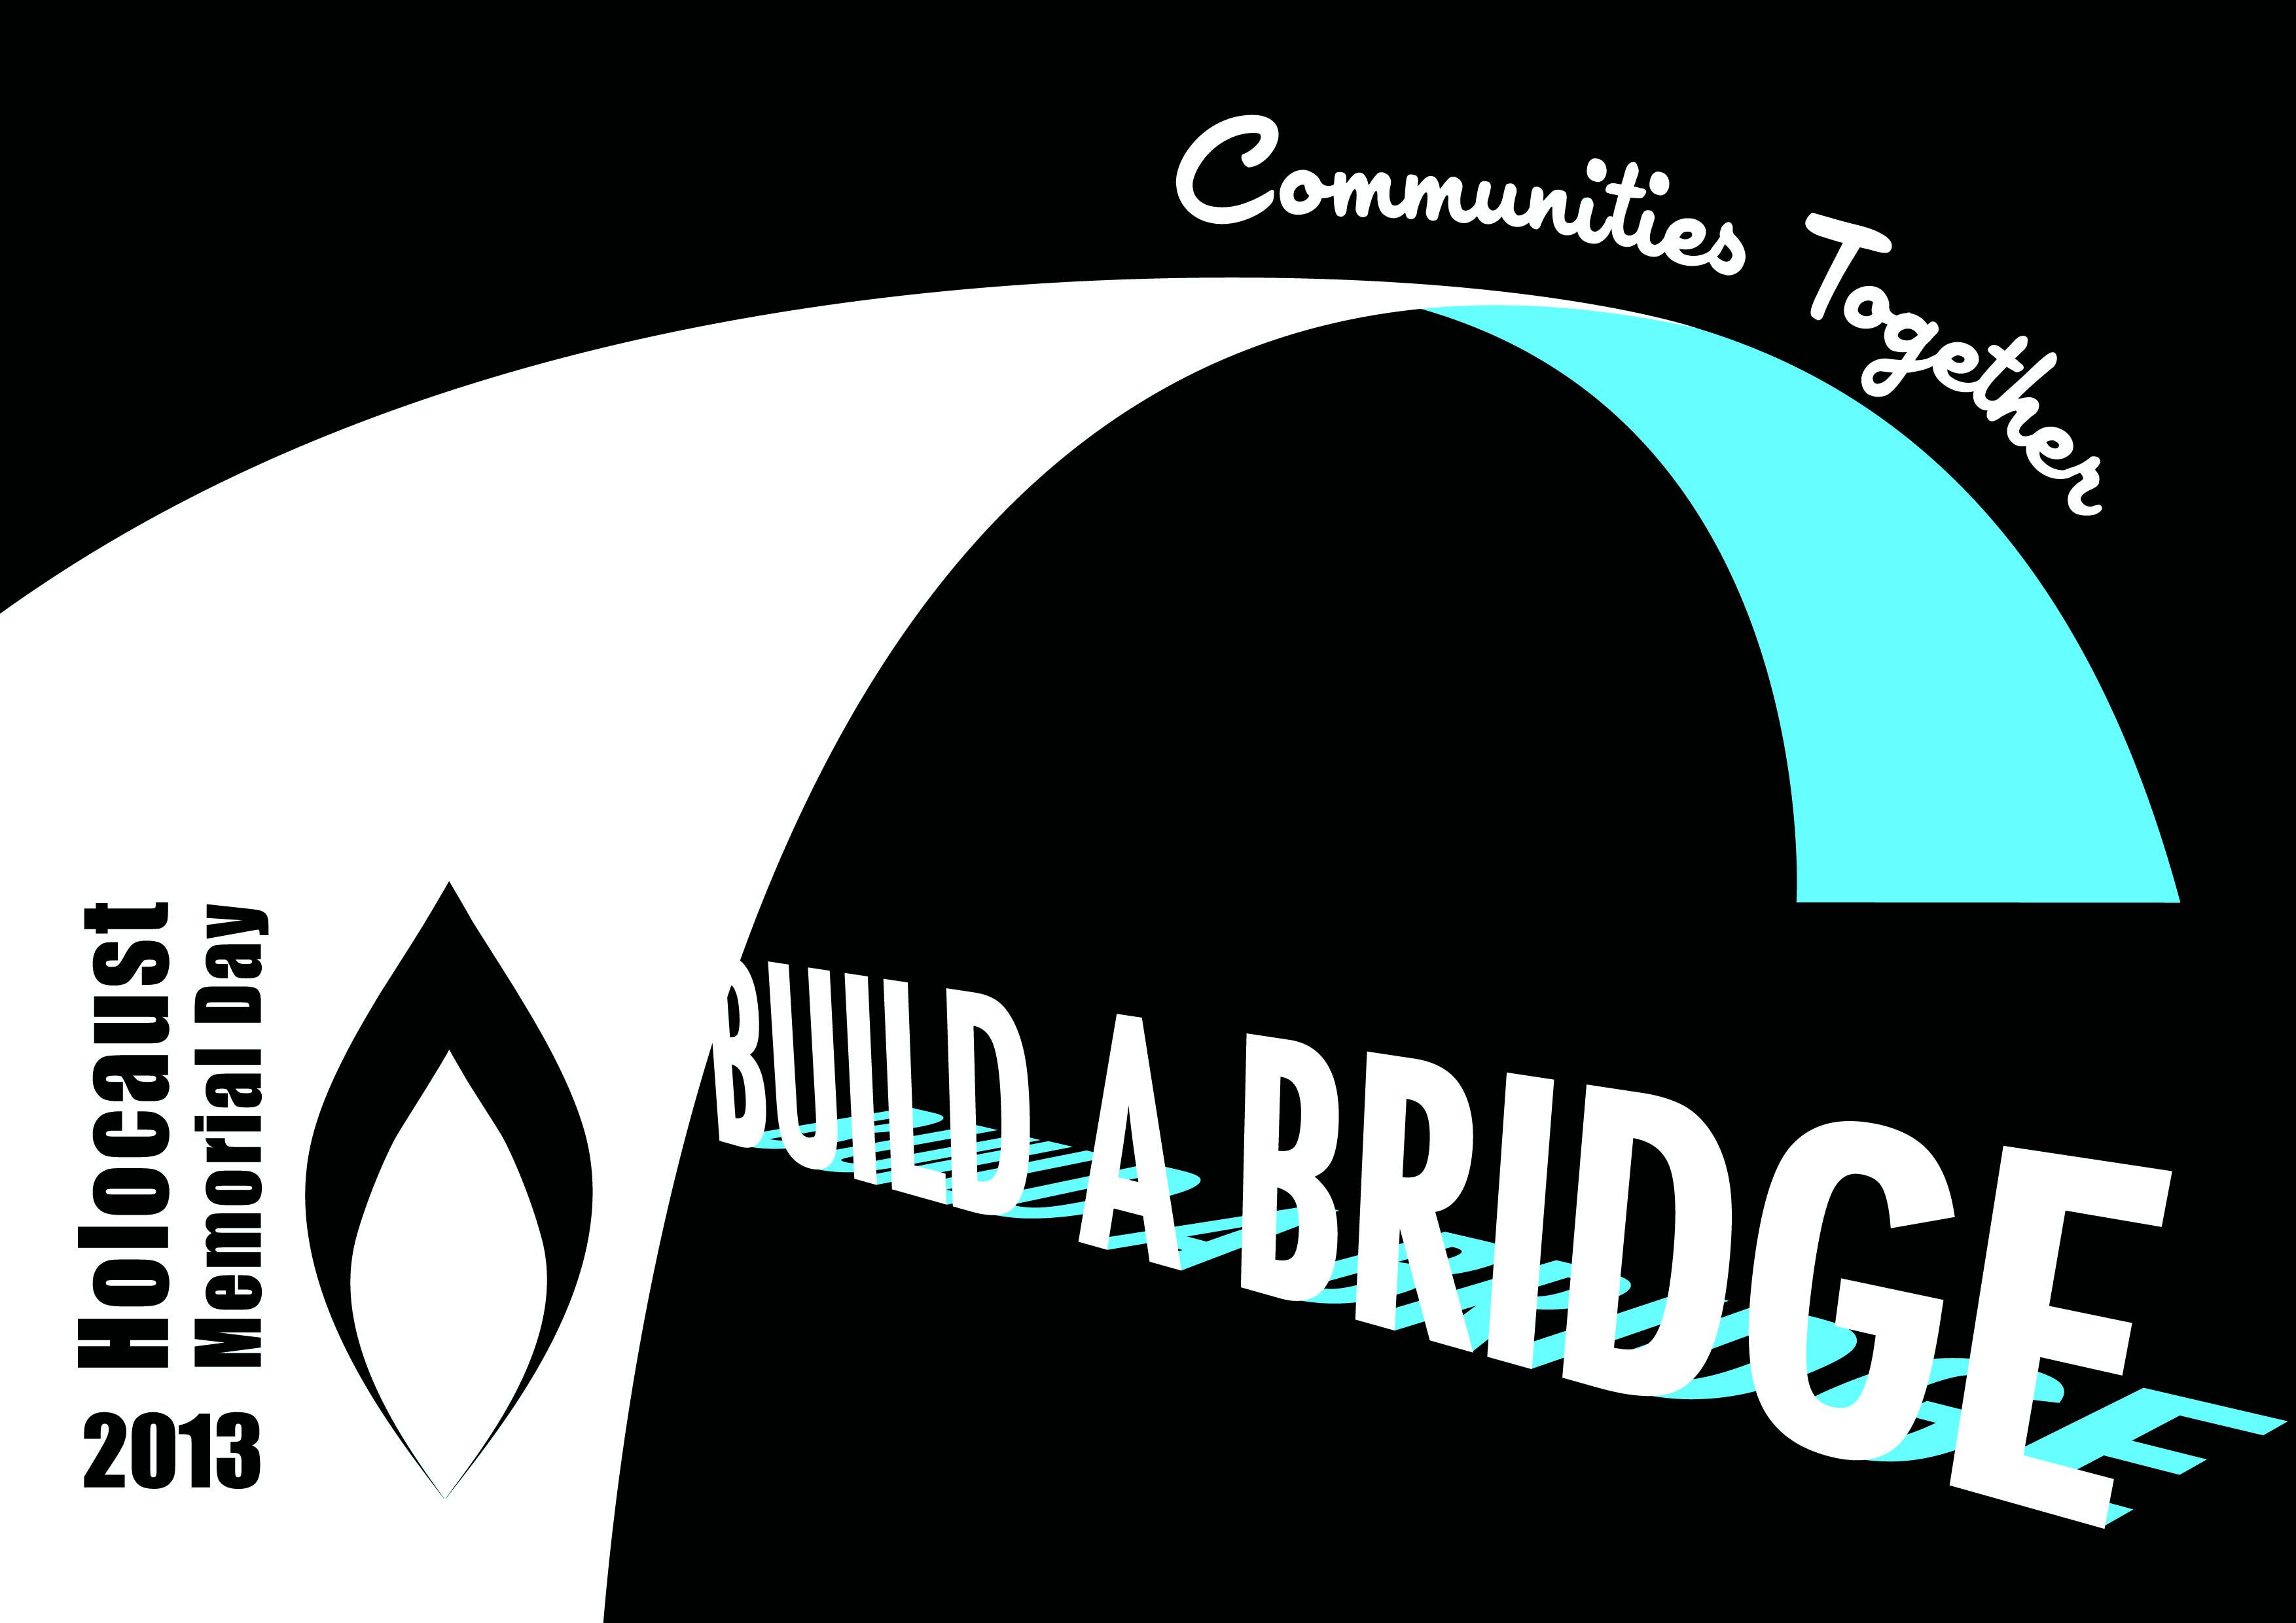 HMD_2013_Logo_Cyan_on_Black_jpeg_1